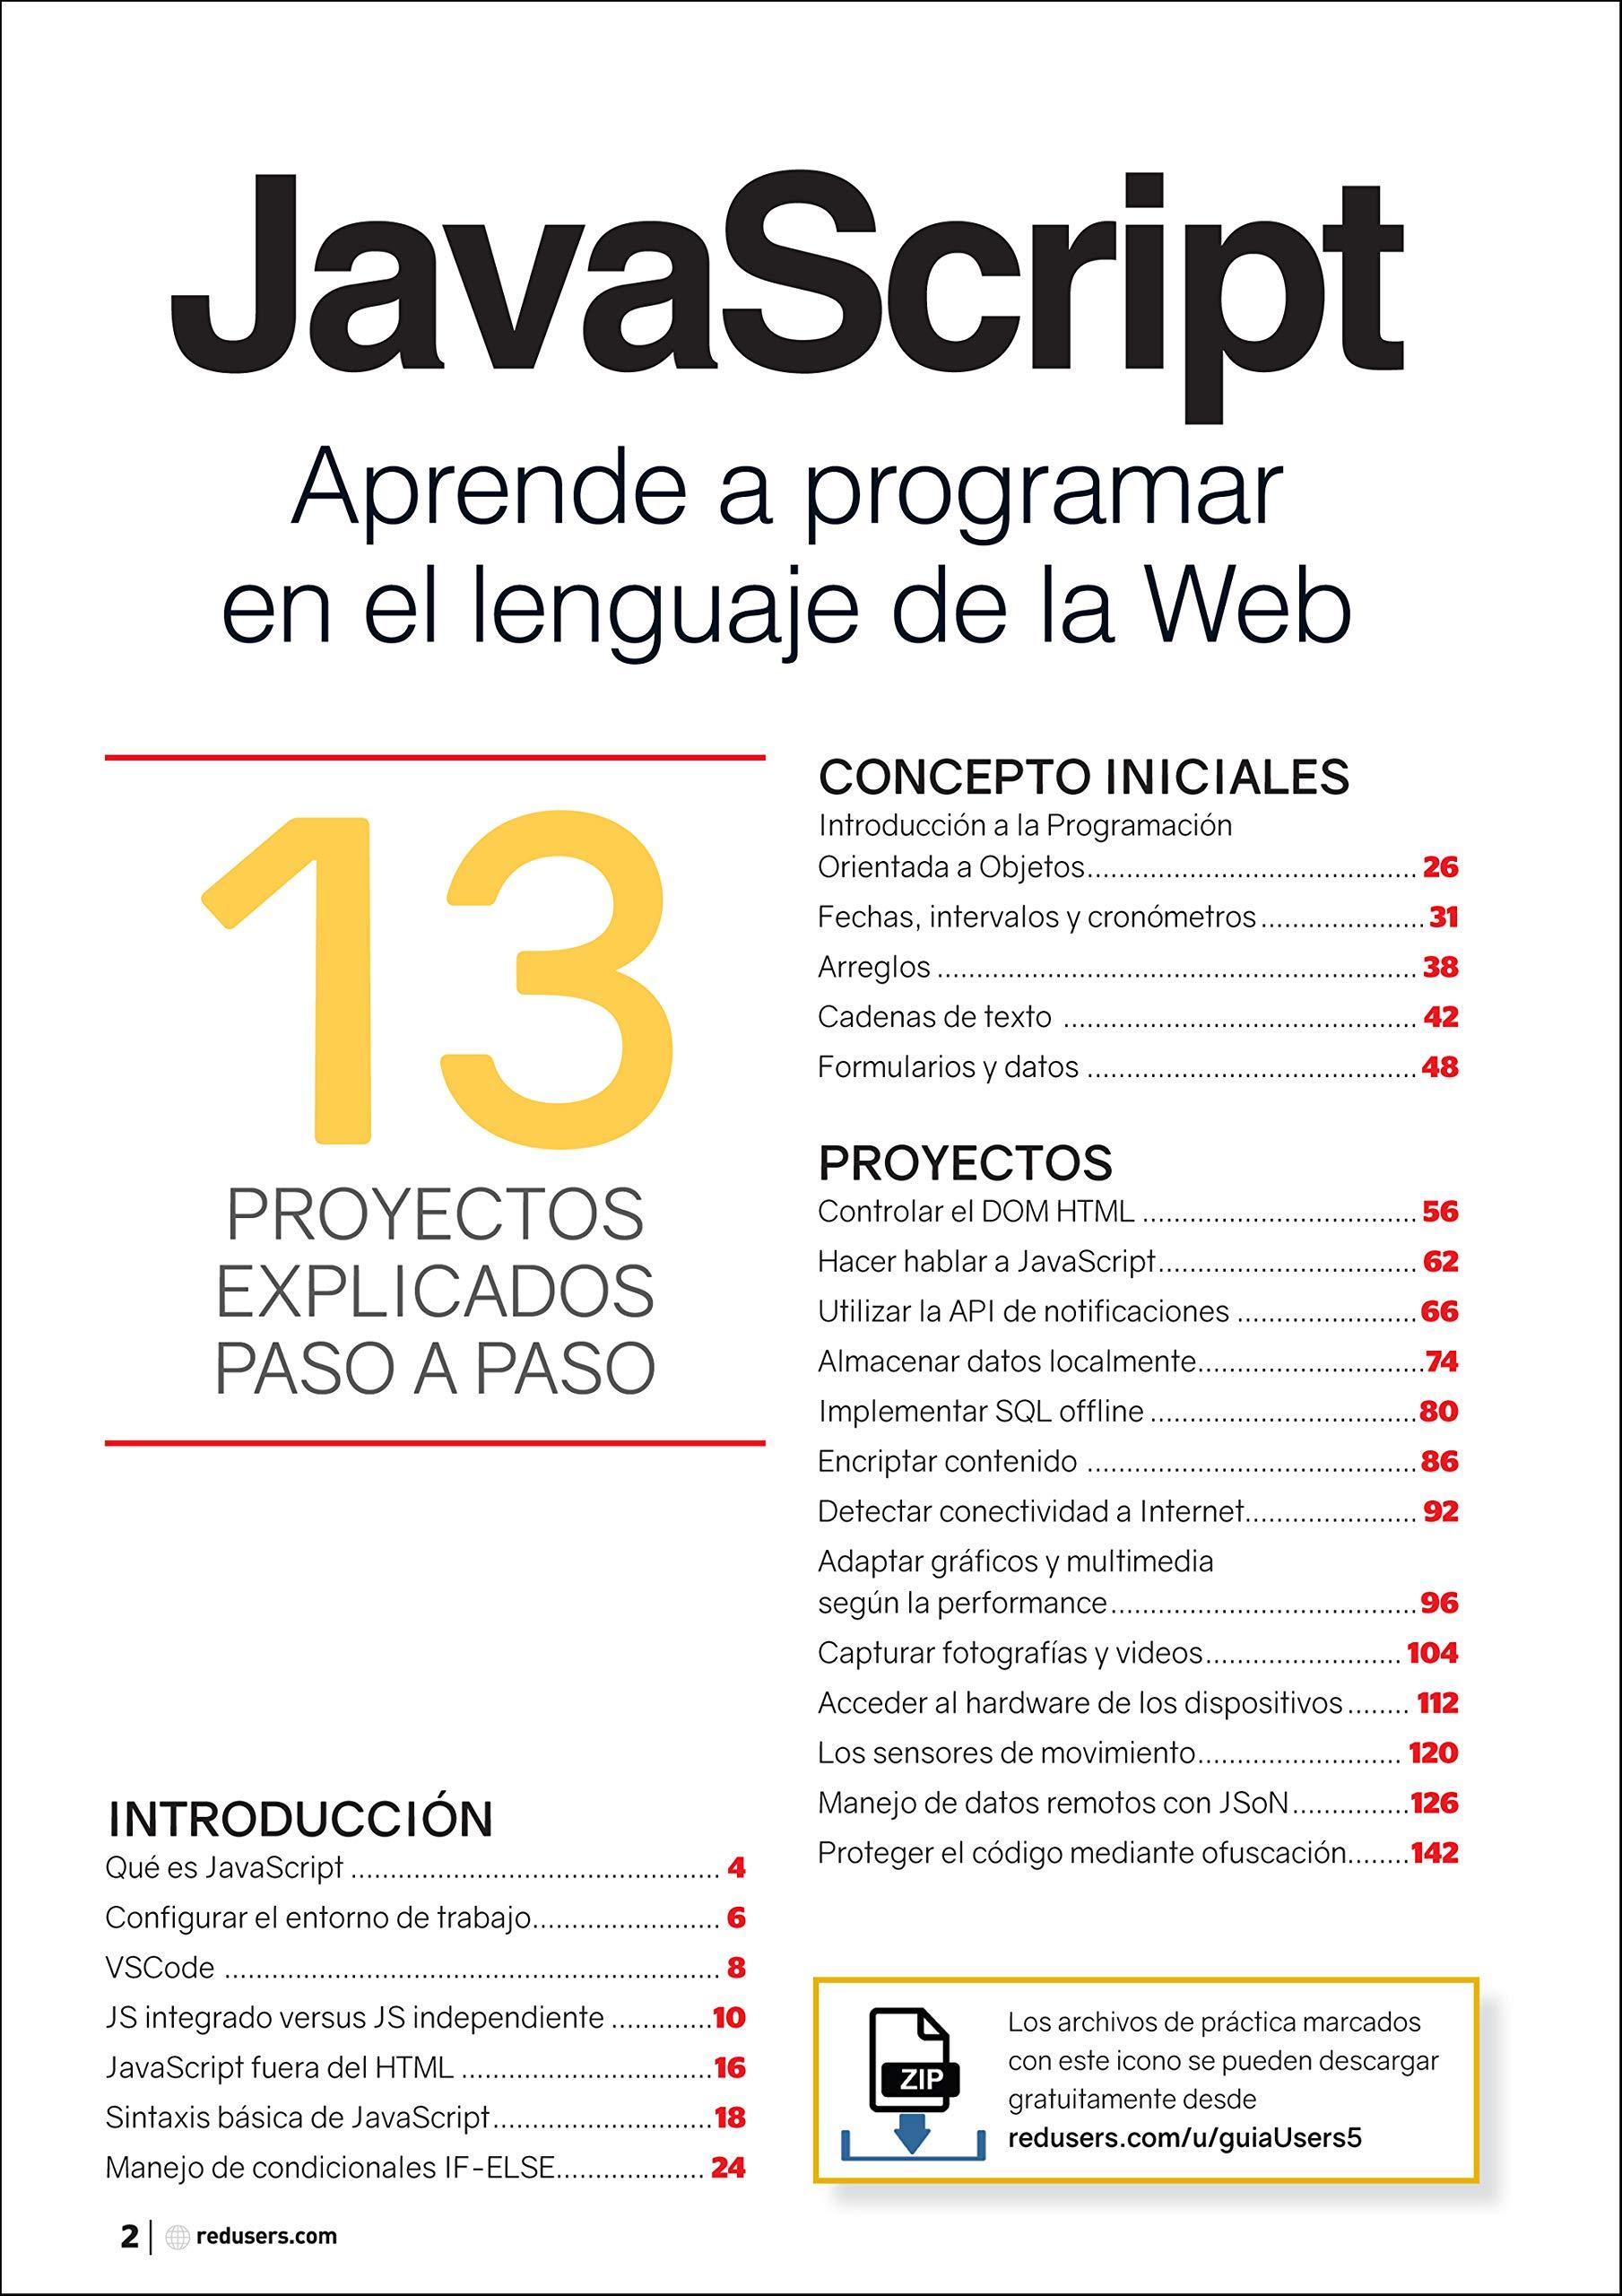 JavaScript - Aprende a programar en el lenguaje de la Web (Spanish Edition): Staff Users, Users, Español;Espaniol;Espanol: 9789874958082: Amazon.com: Books